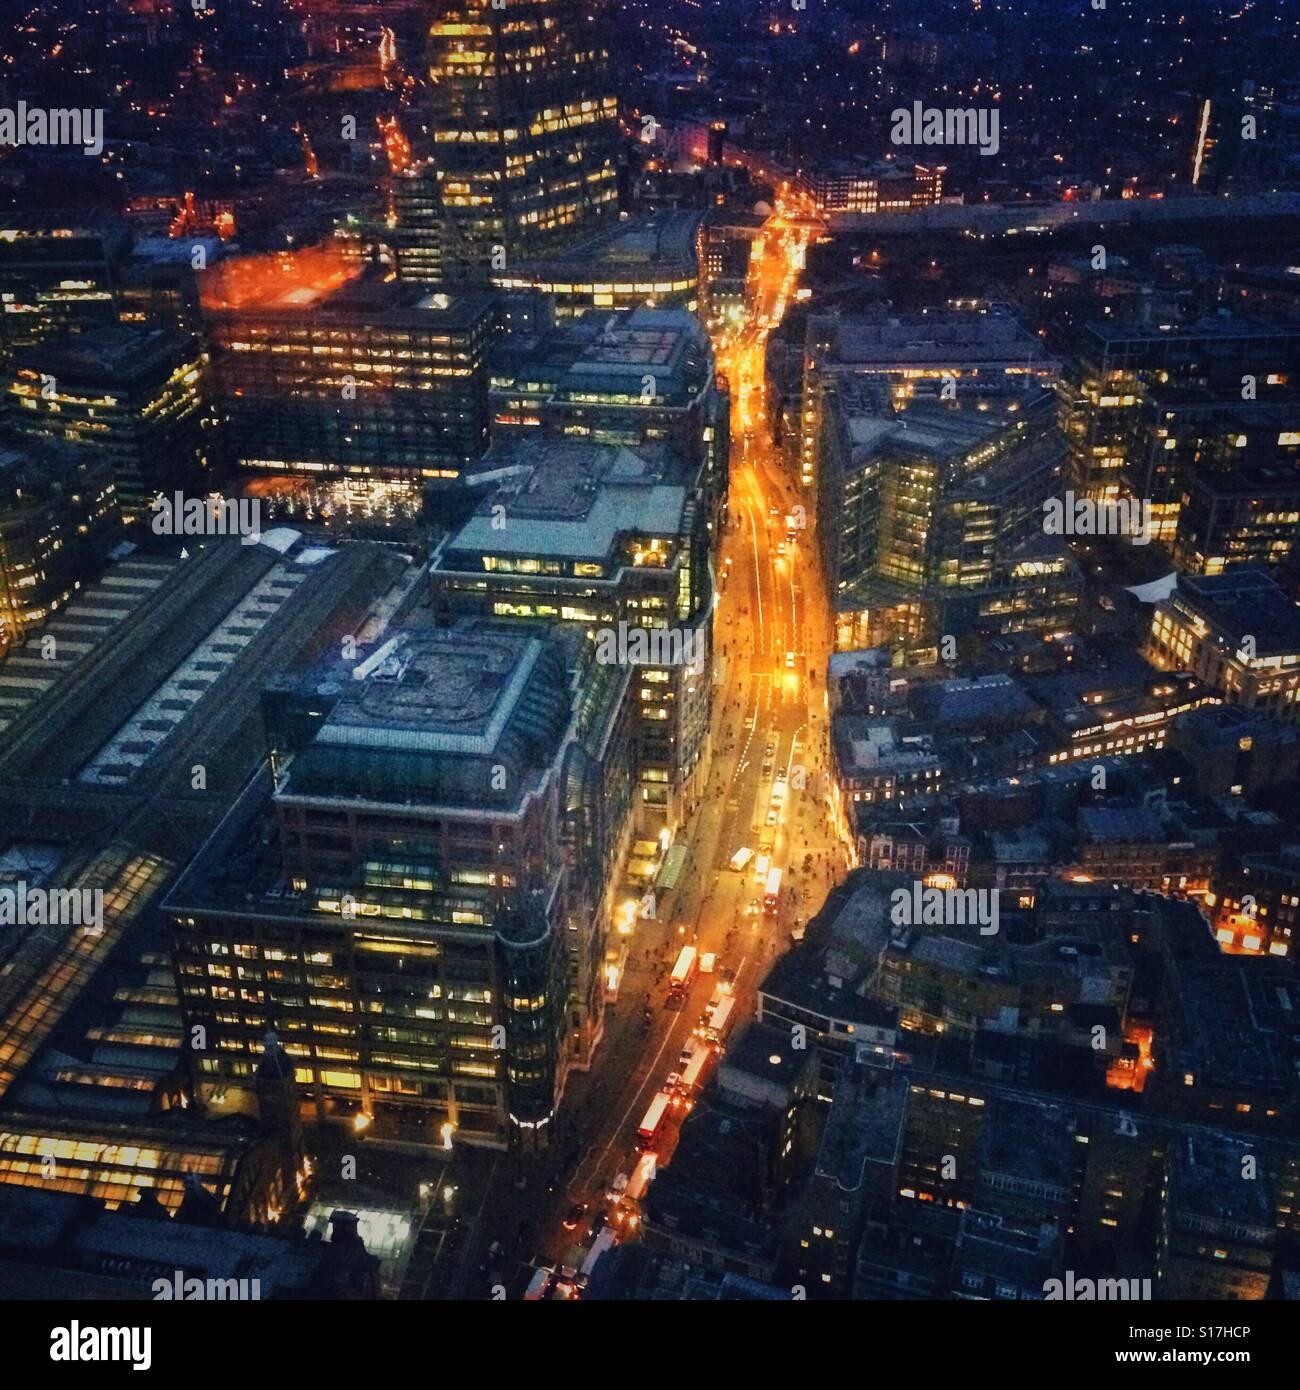 Traffic on Bishopsgate, City of London - Stock Image